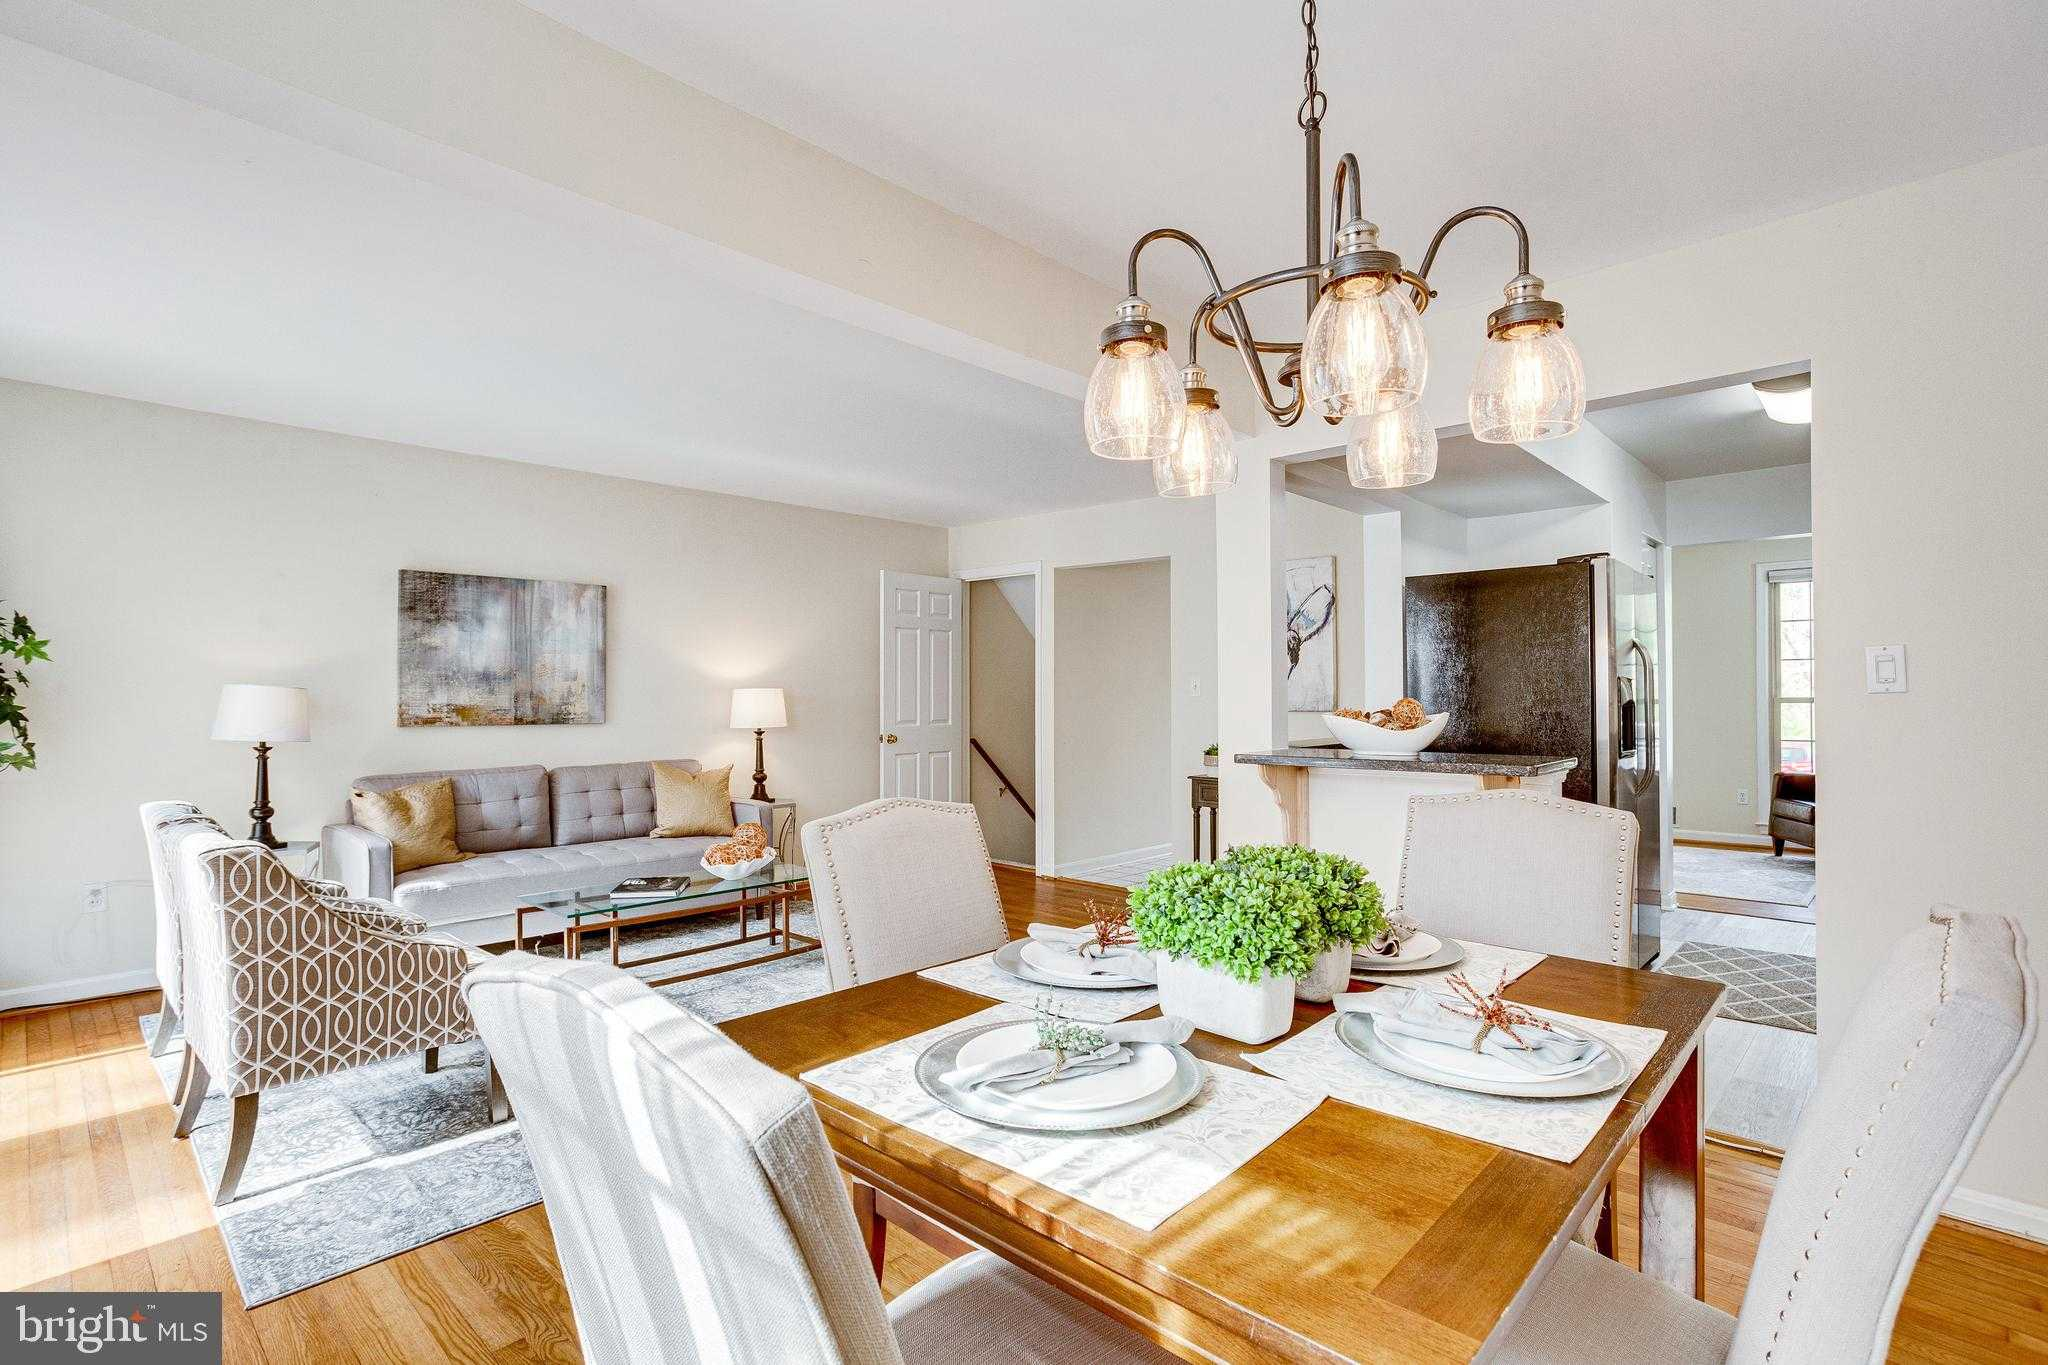 $499,000 - 3Br/4Ba -  for Sale in Rock Creek Palisades, Kensington